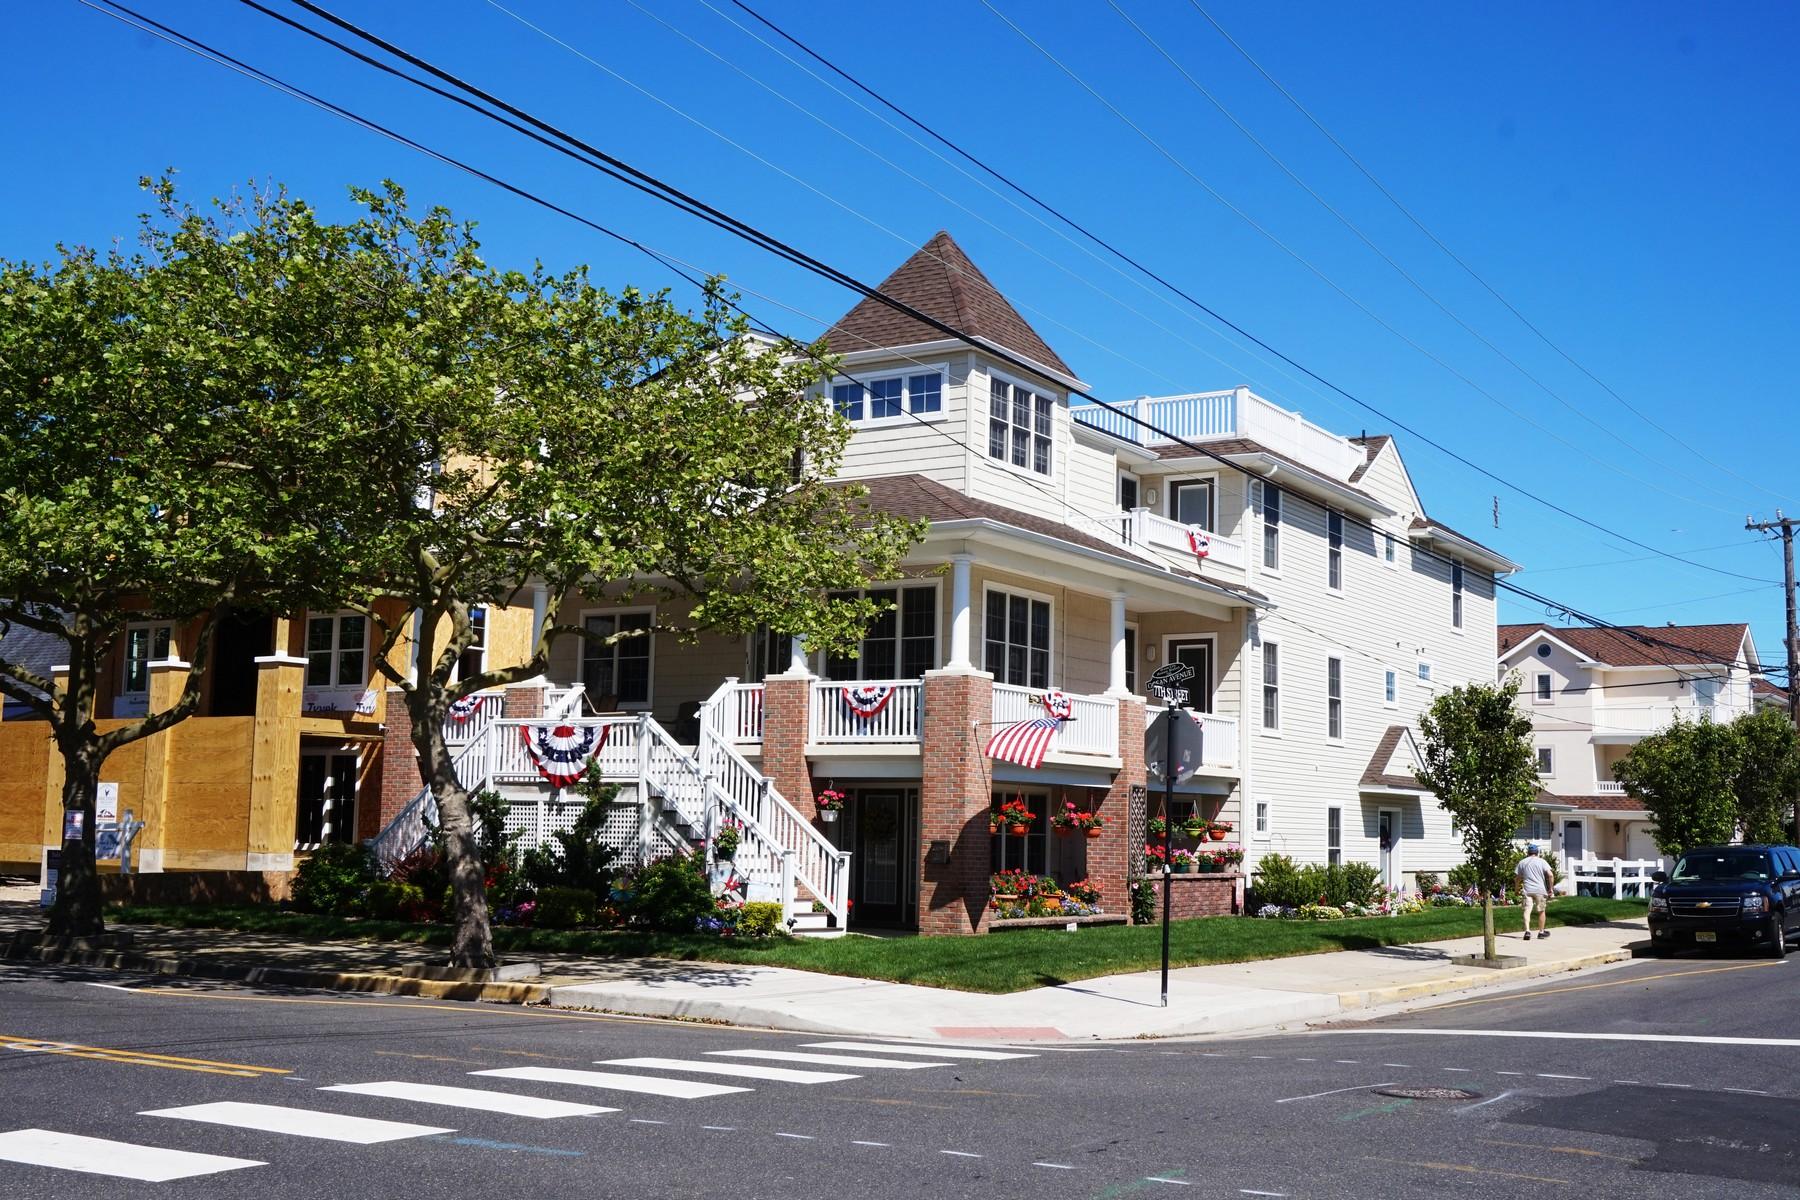 Condominium for Sale at First Floor Corner Condo 641 Ocean Avenue First Floor Ocean City, New Jersey 08226 United States